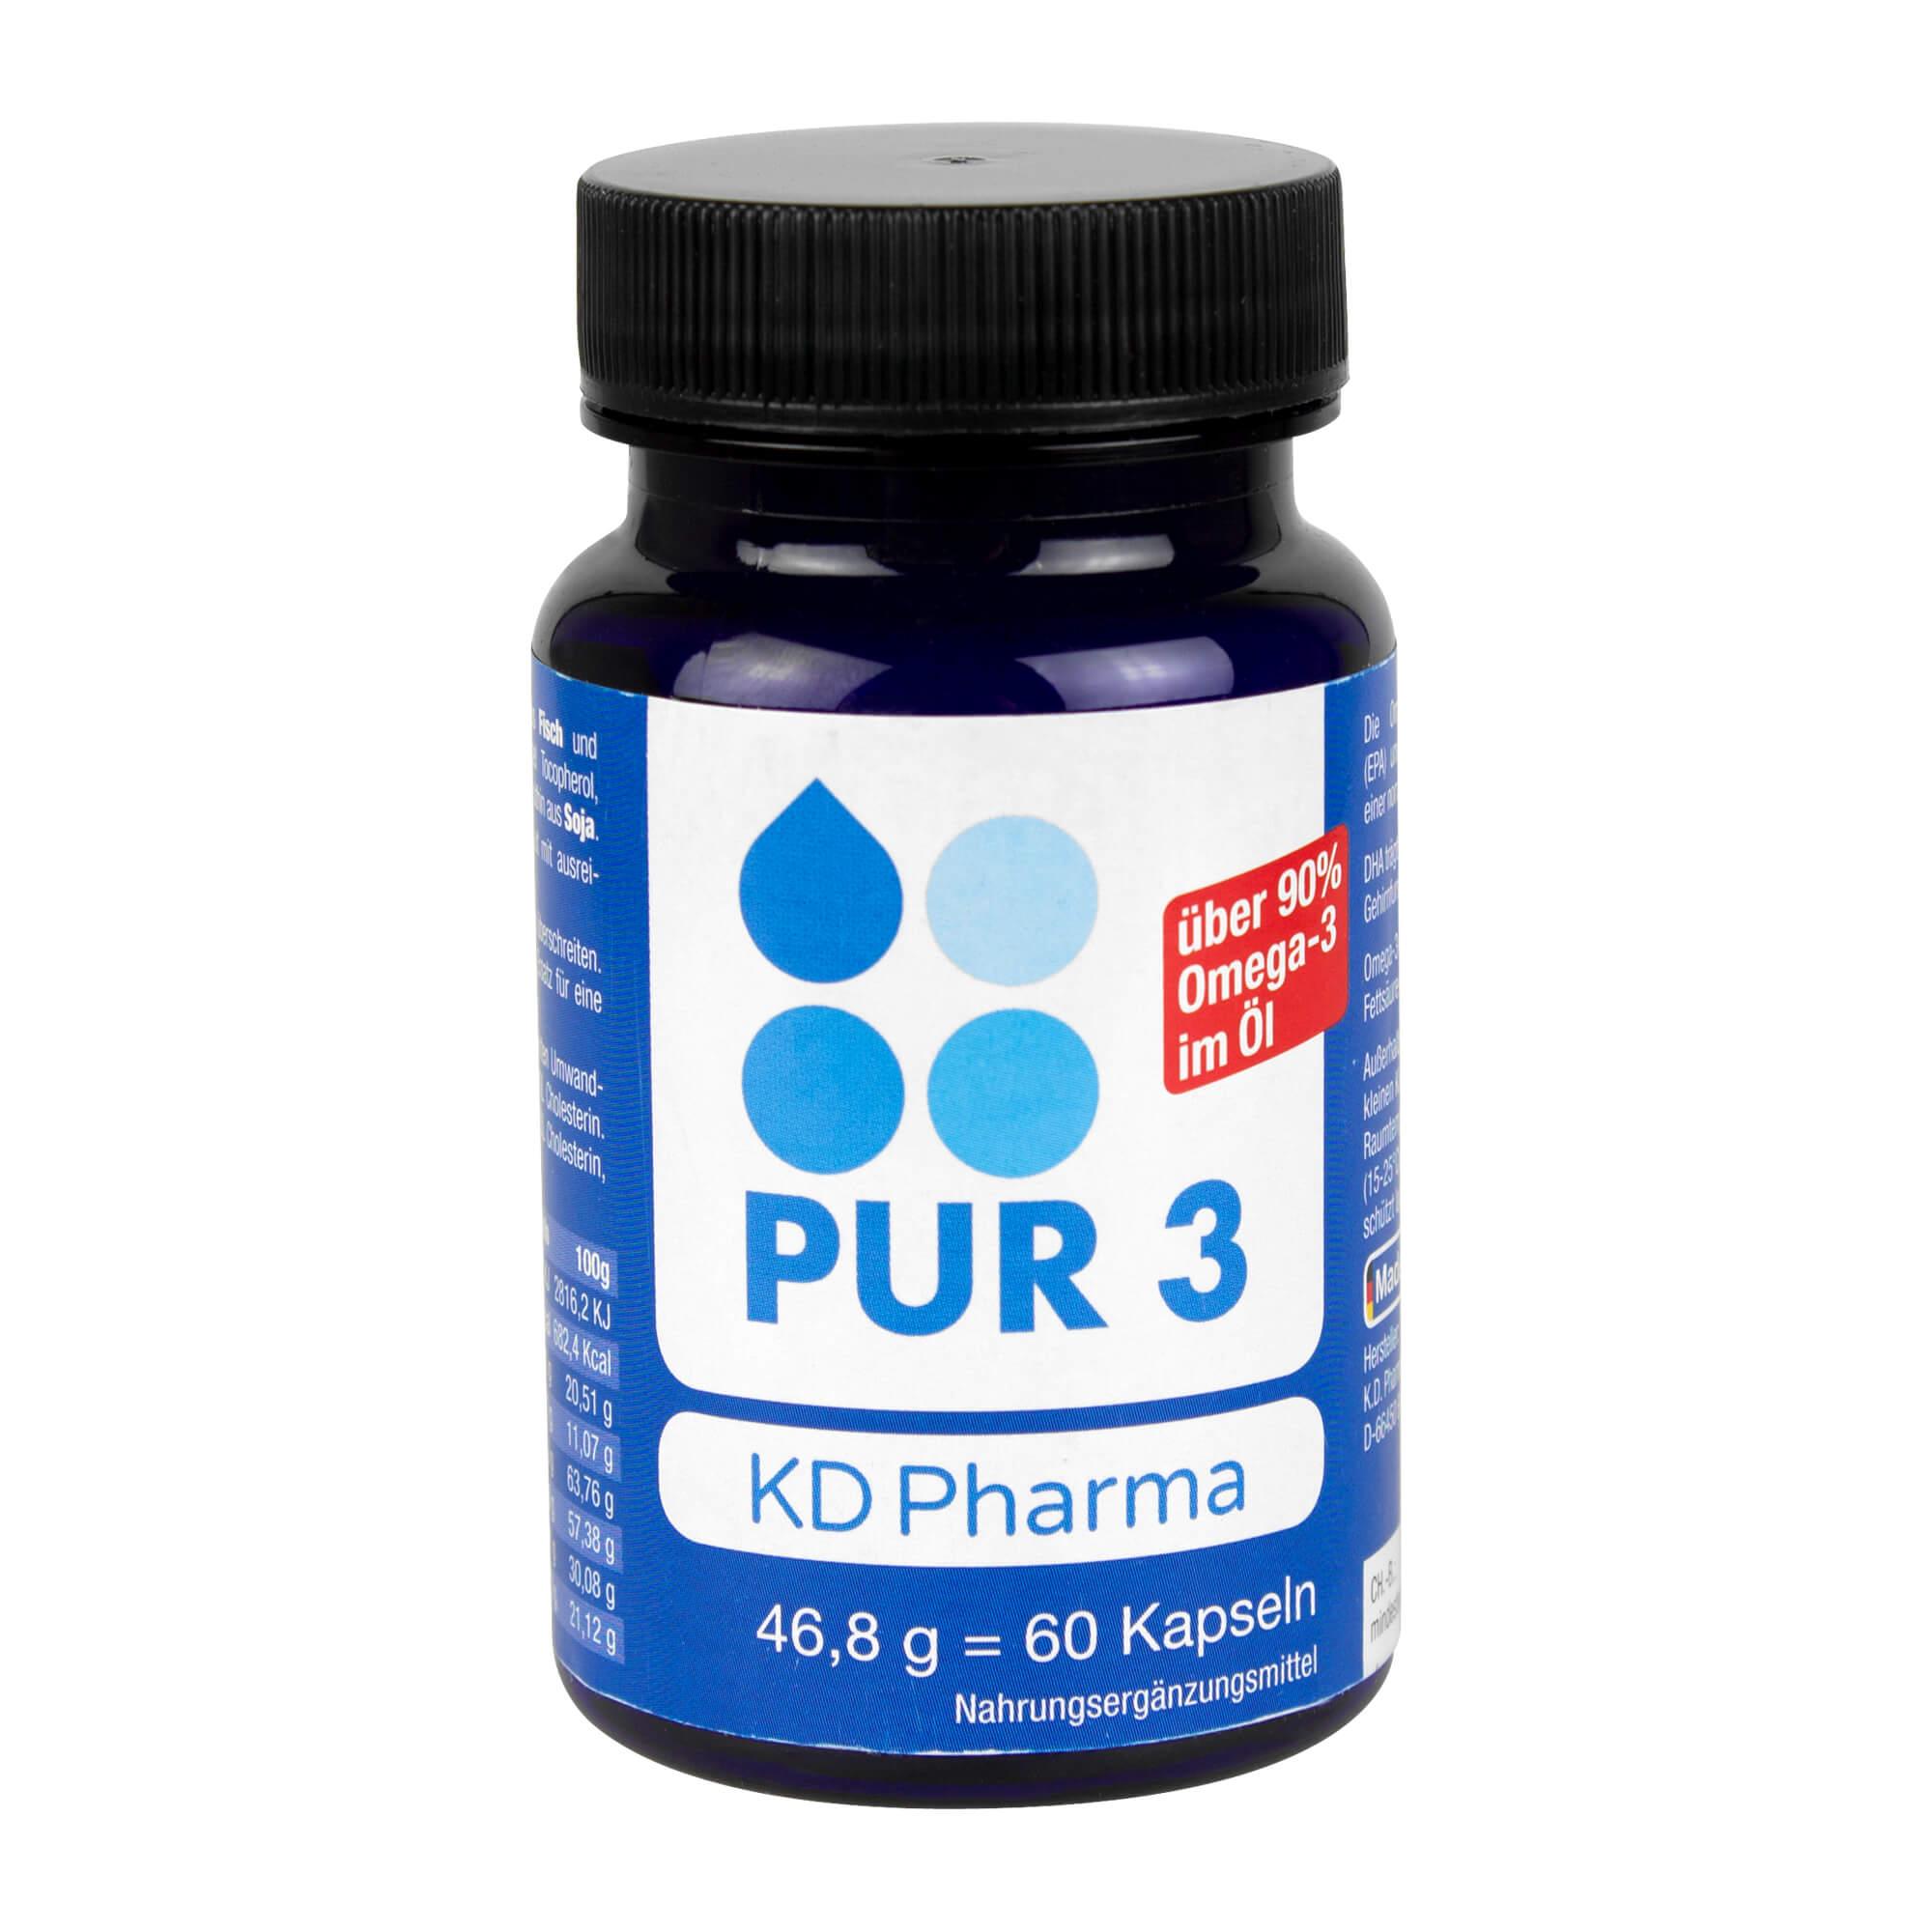 PUR 3 Omega-3-Öl-Kapseln